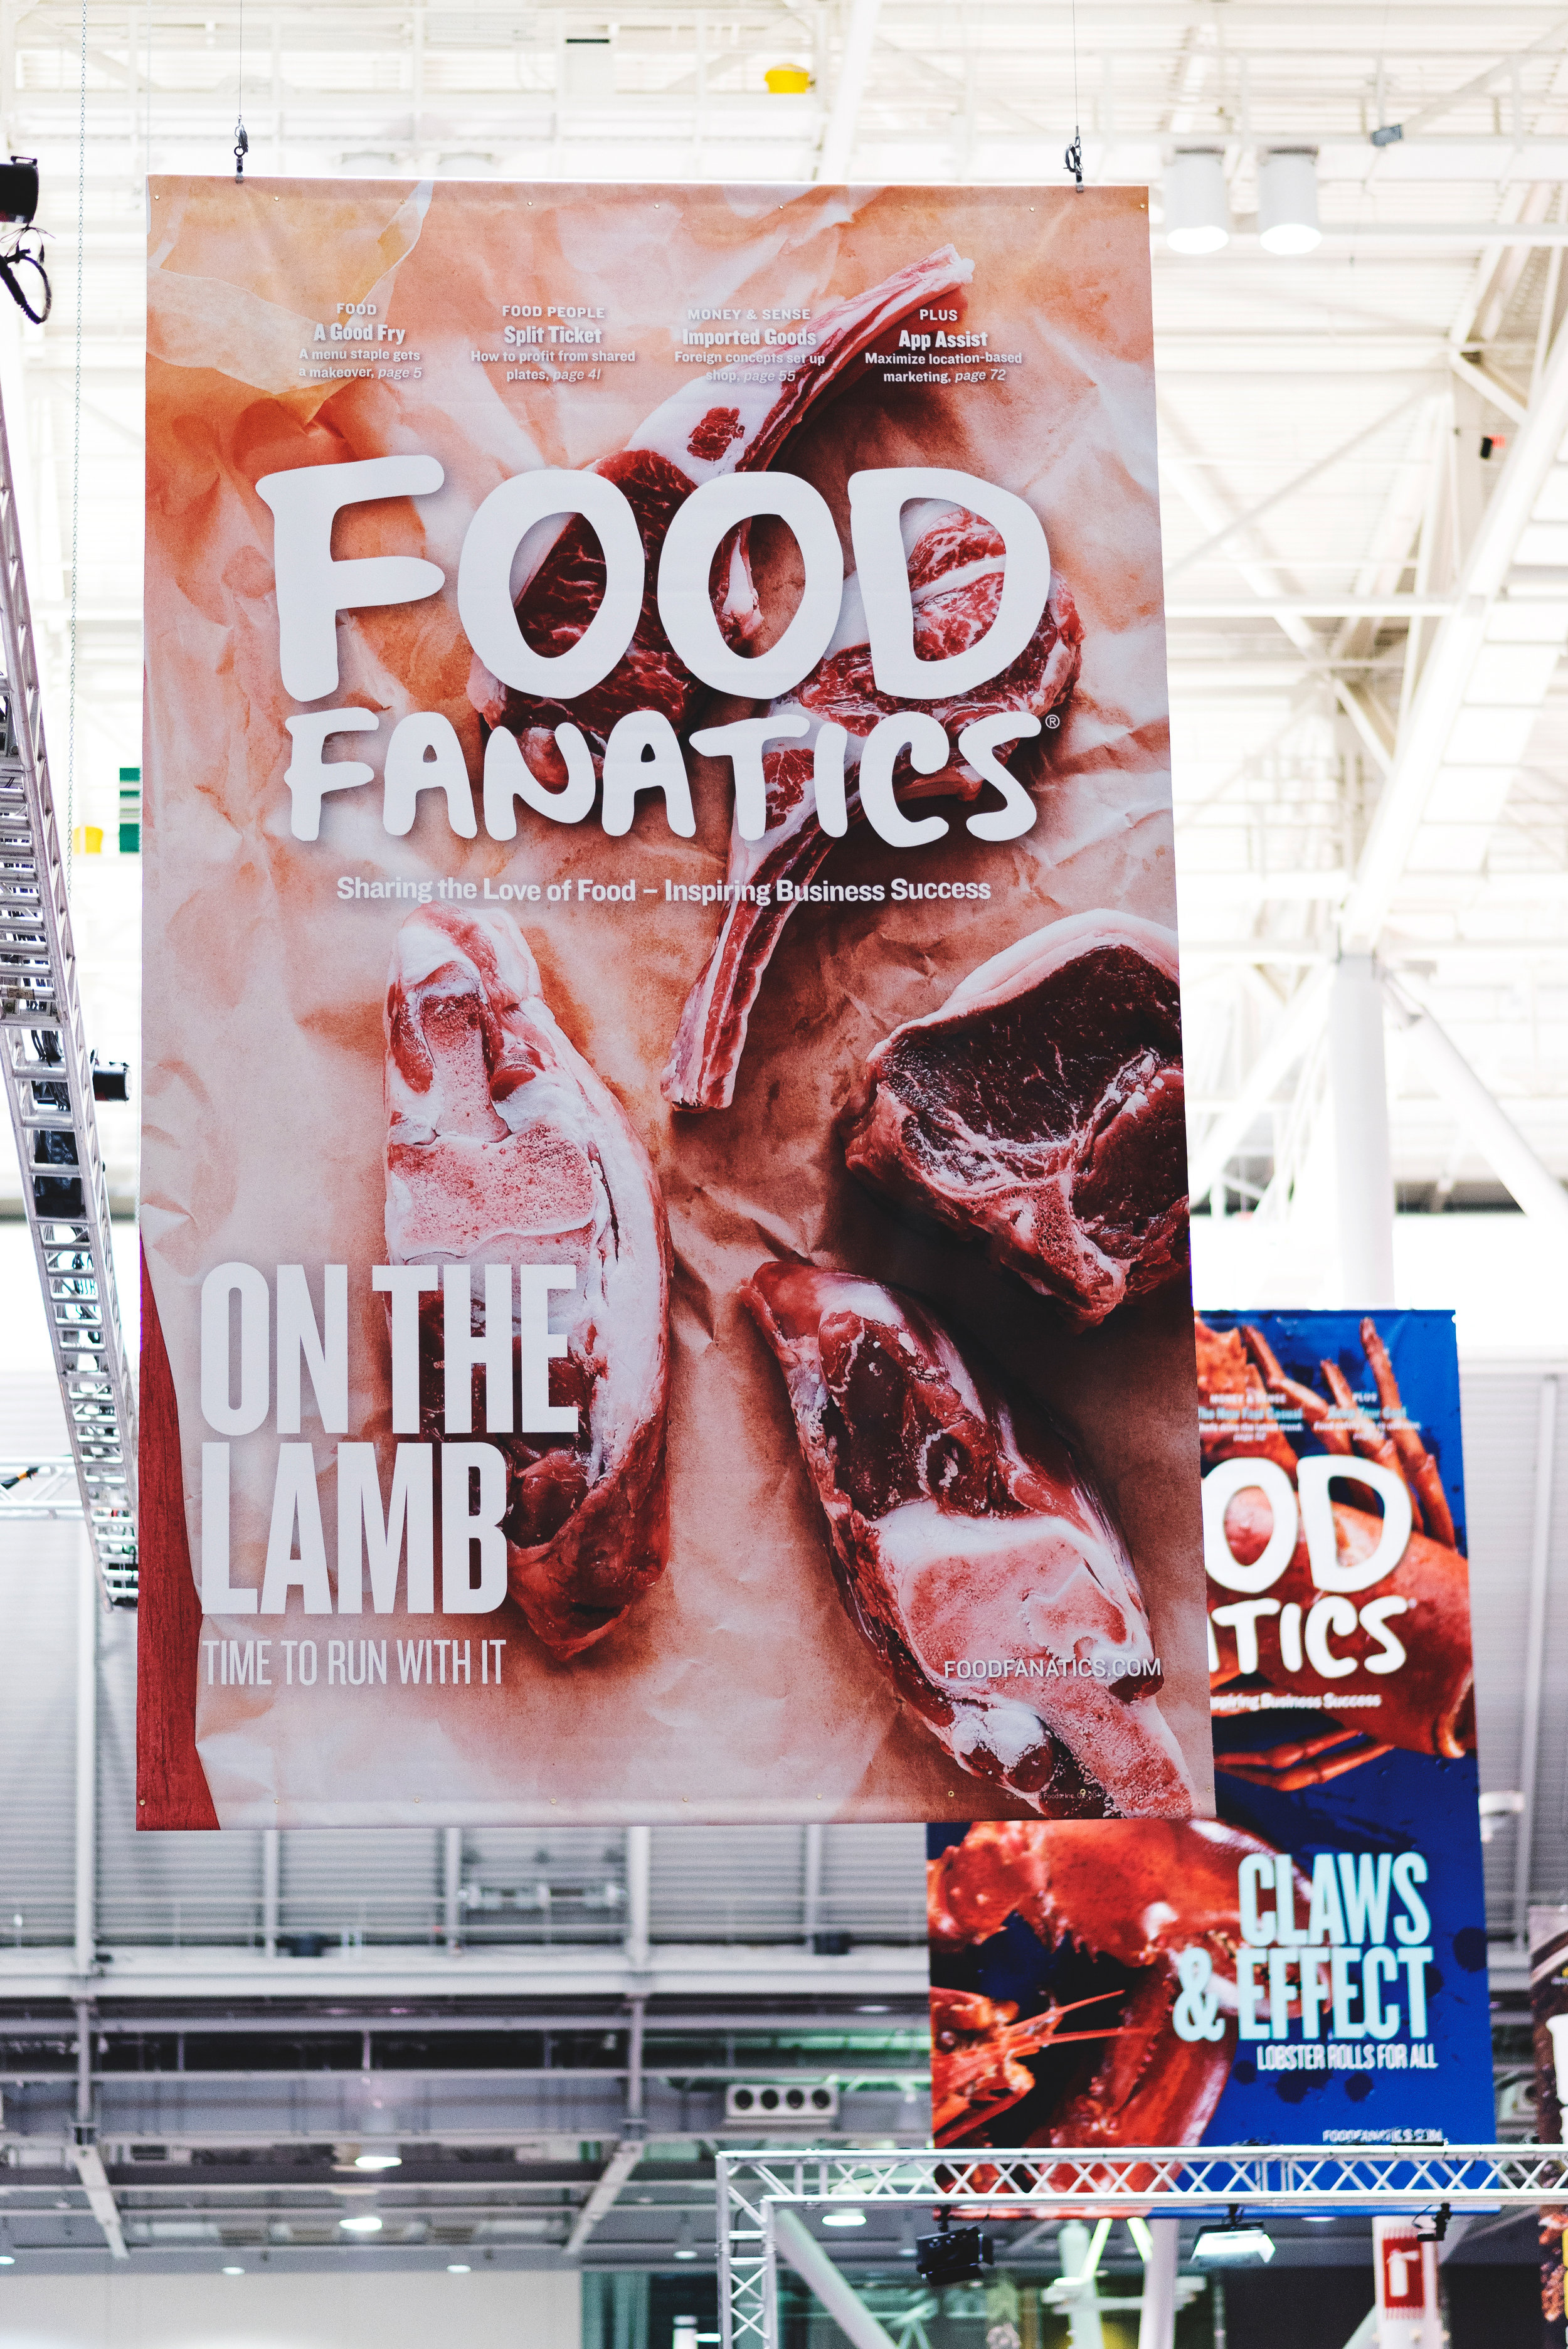 FoodFanaticsLive-Event-Food-Photography128.jpg